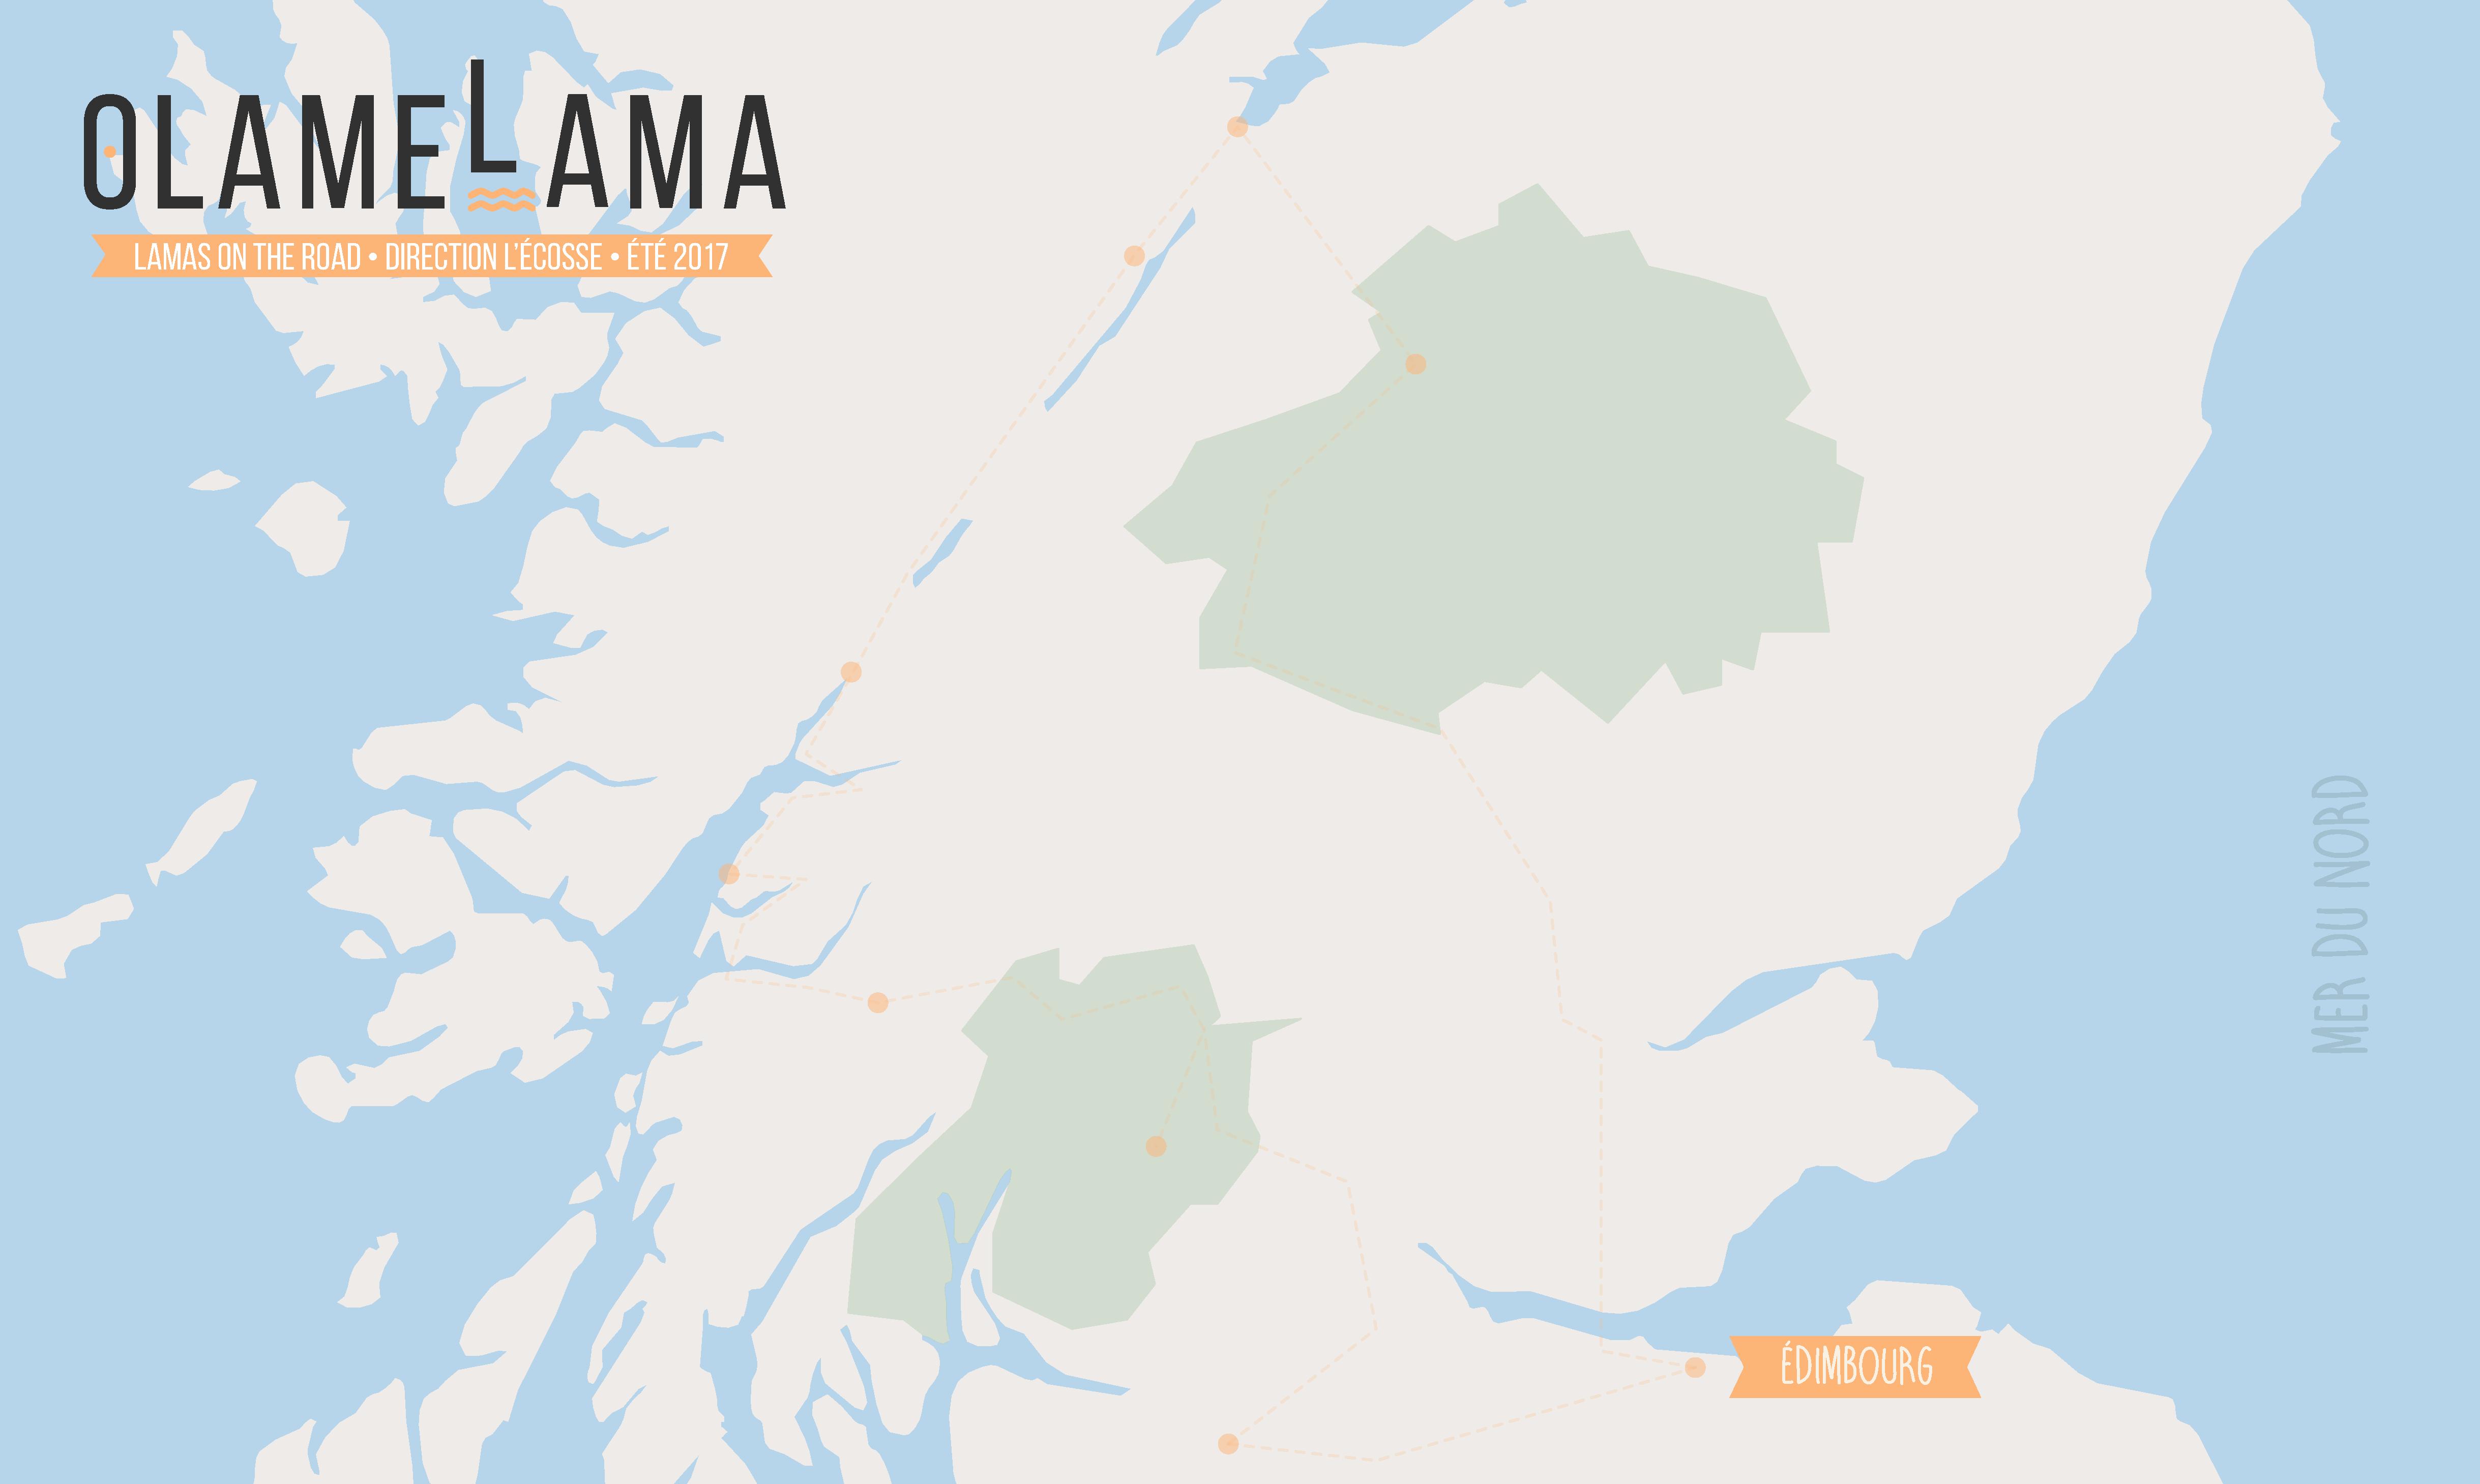 Roadmap Voyage en Écosse - Edimbourg - Olamelama